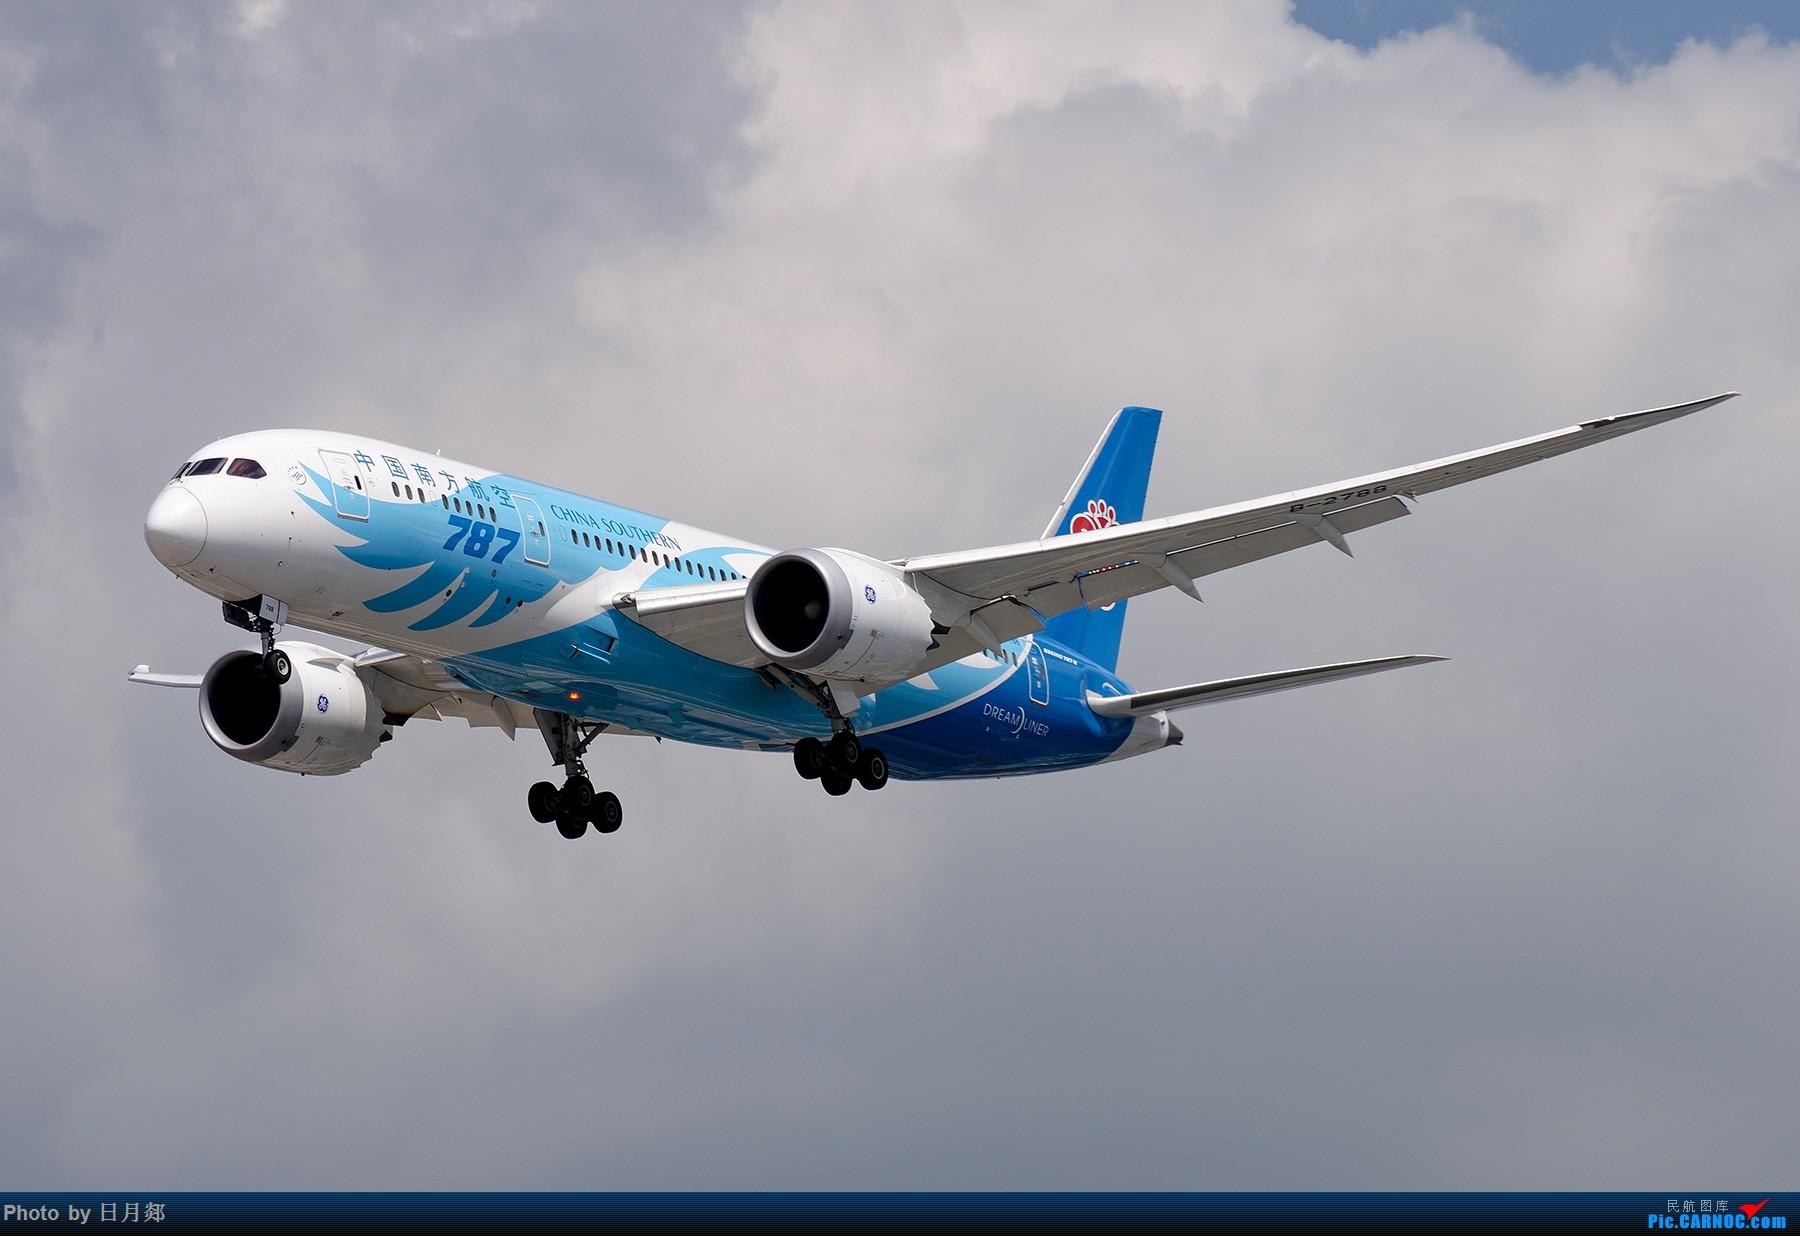 Re:[原创]【SHA拍机*1800大图】图要抓紧发,不然就要炒冷饭,大头镇贴 BOEING 787-8 B-2788 中国上海虹桥国际机场